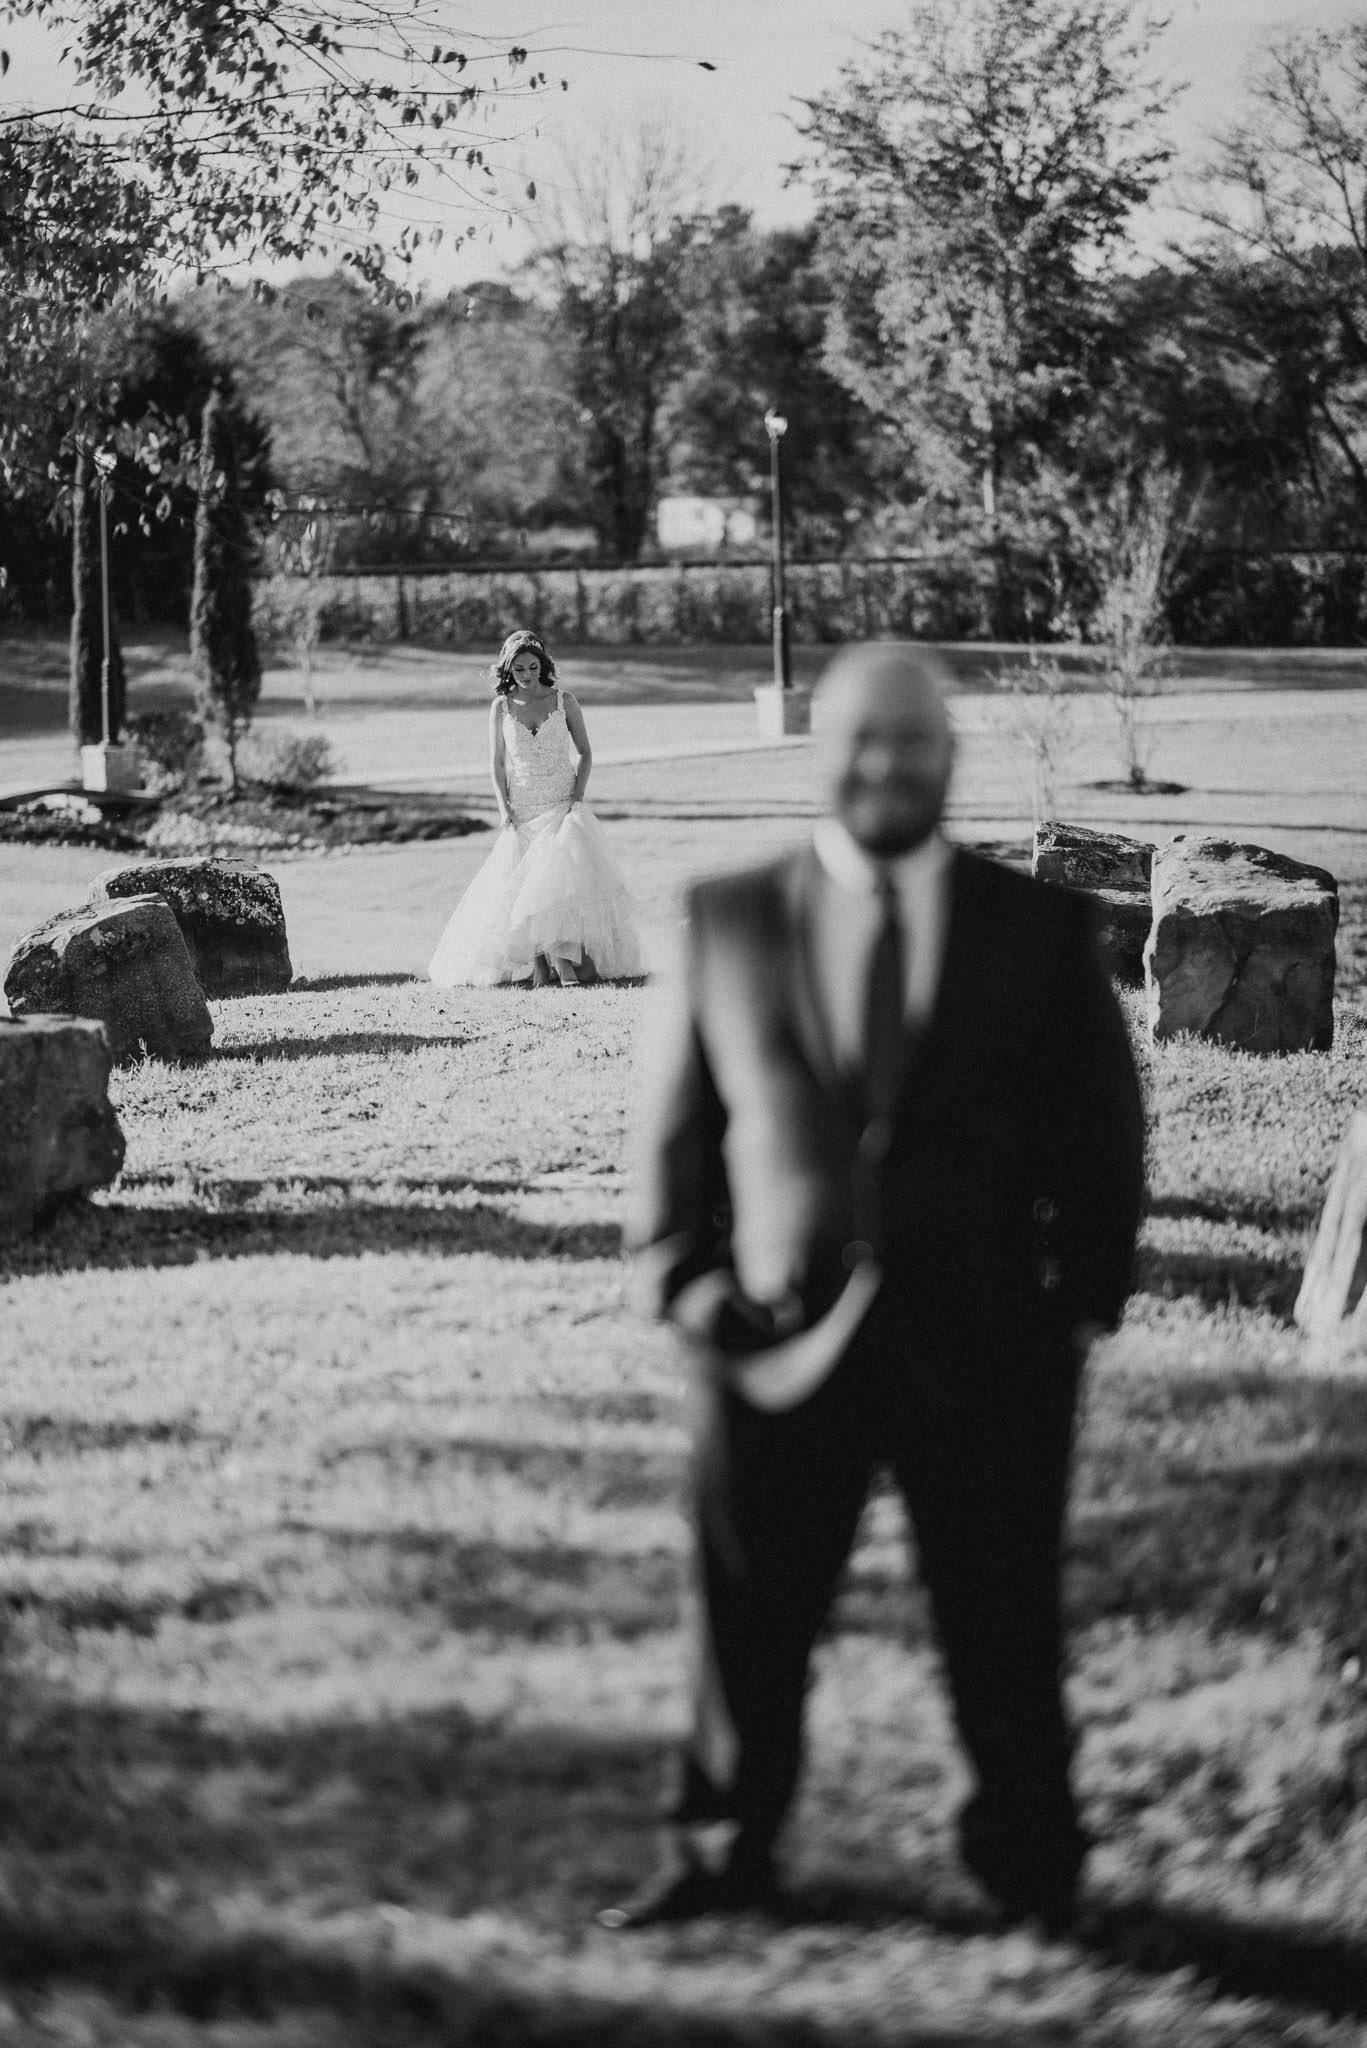 Cynthia-Curtis-Olde-Dobbine-Station-Houston-Wedding-Photographer-sm-44.jpg